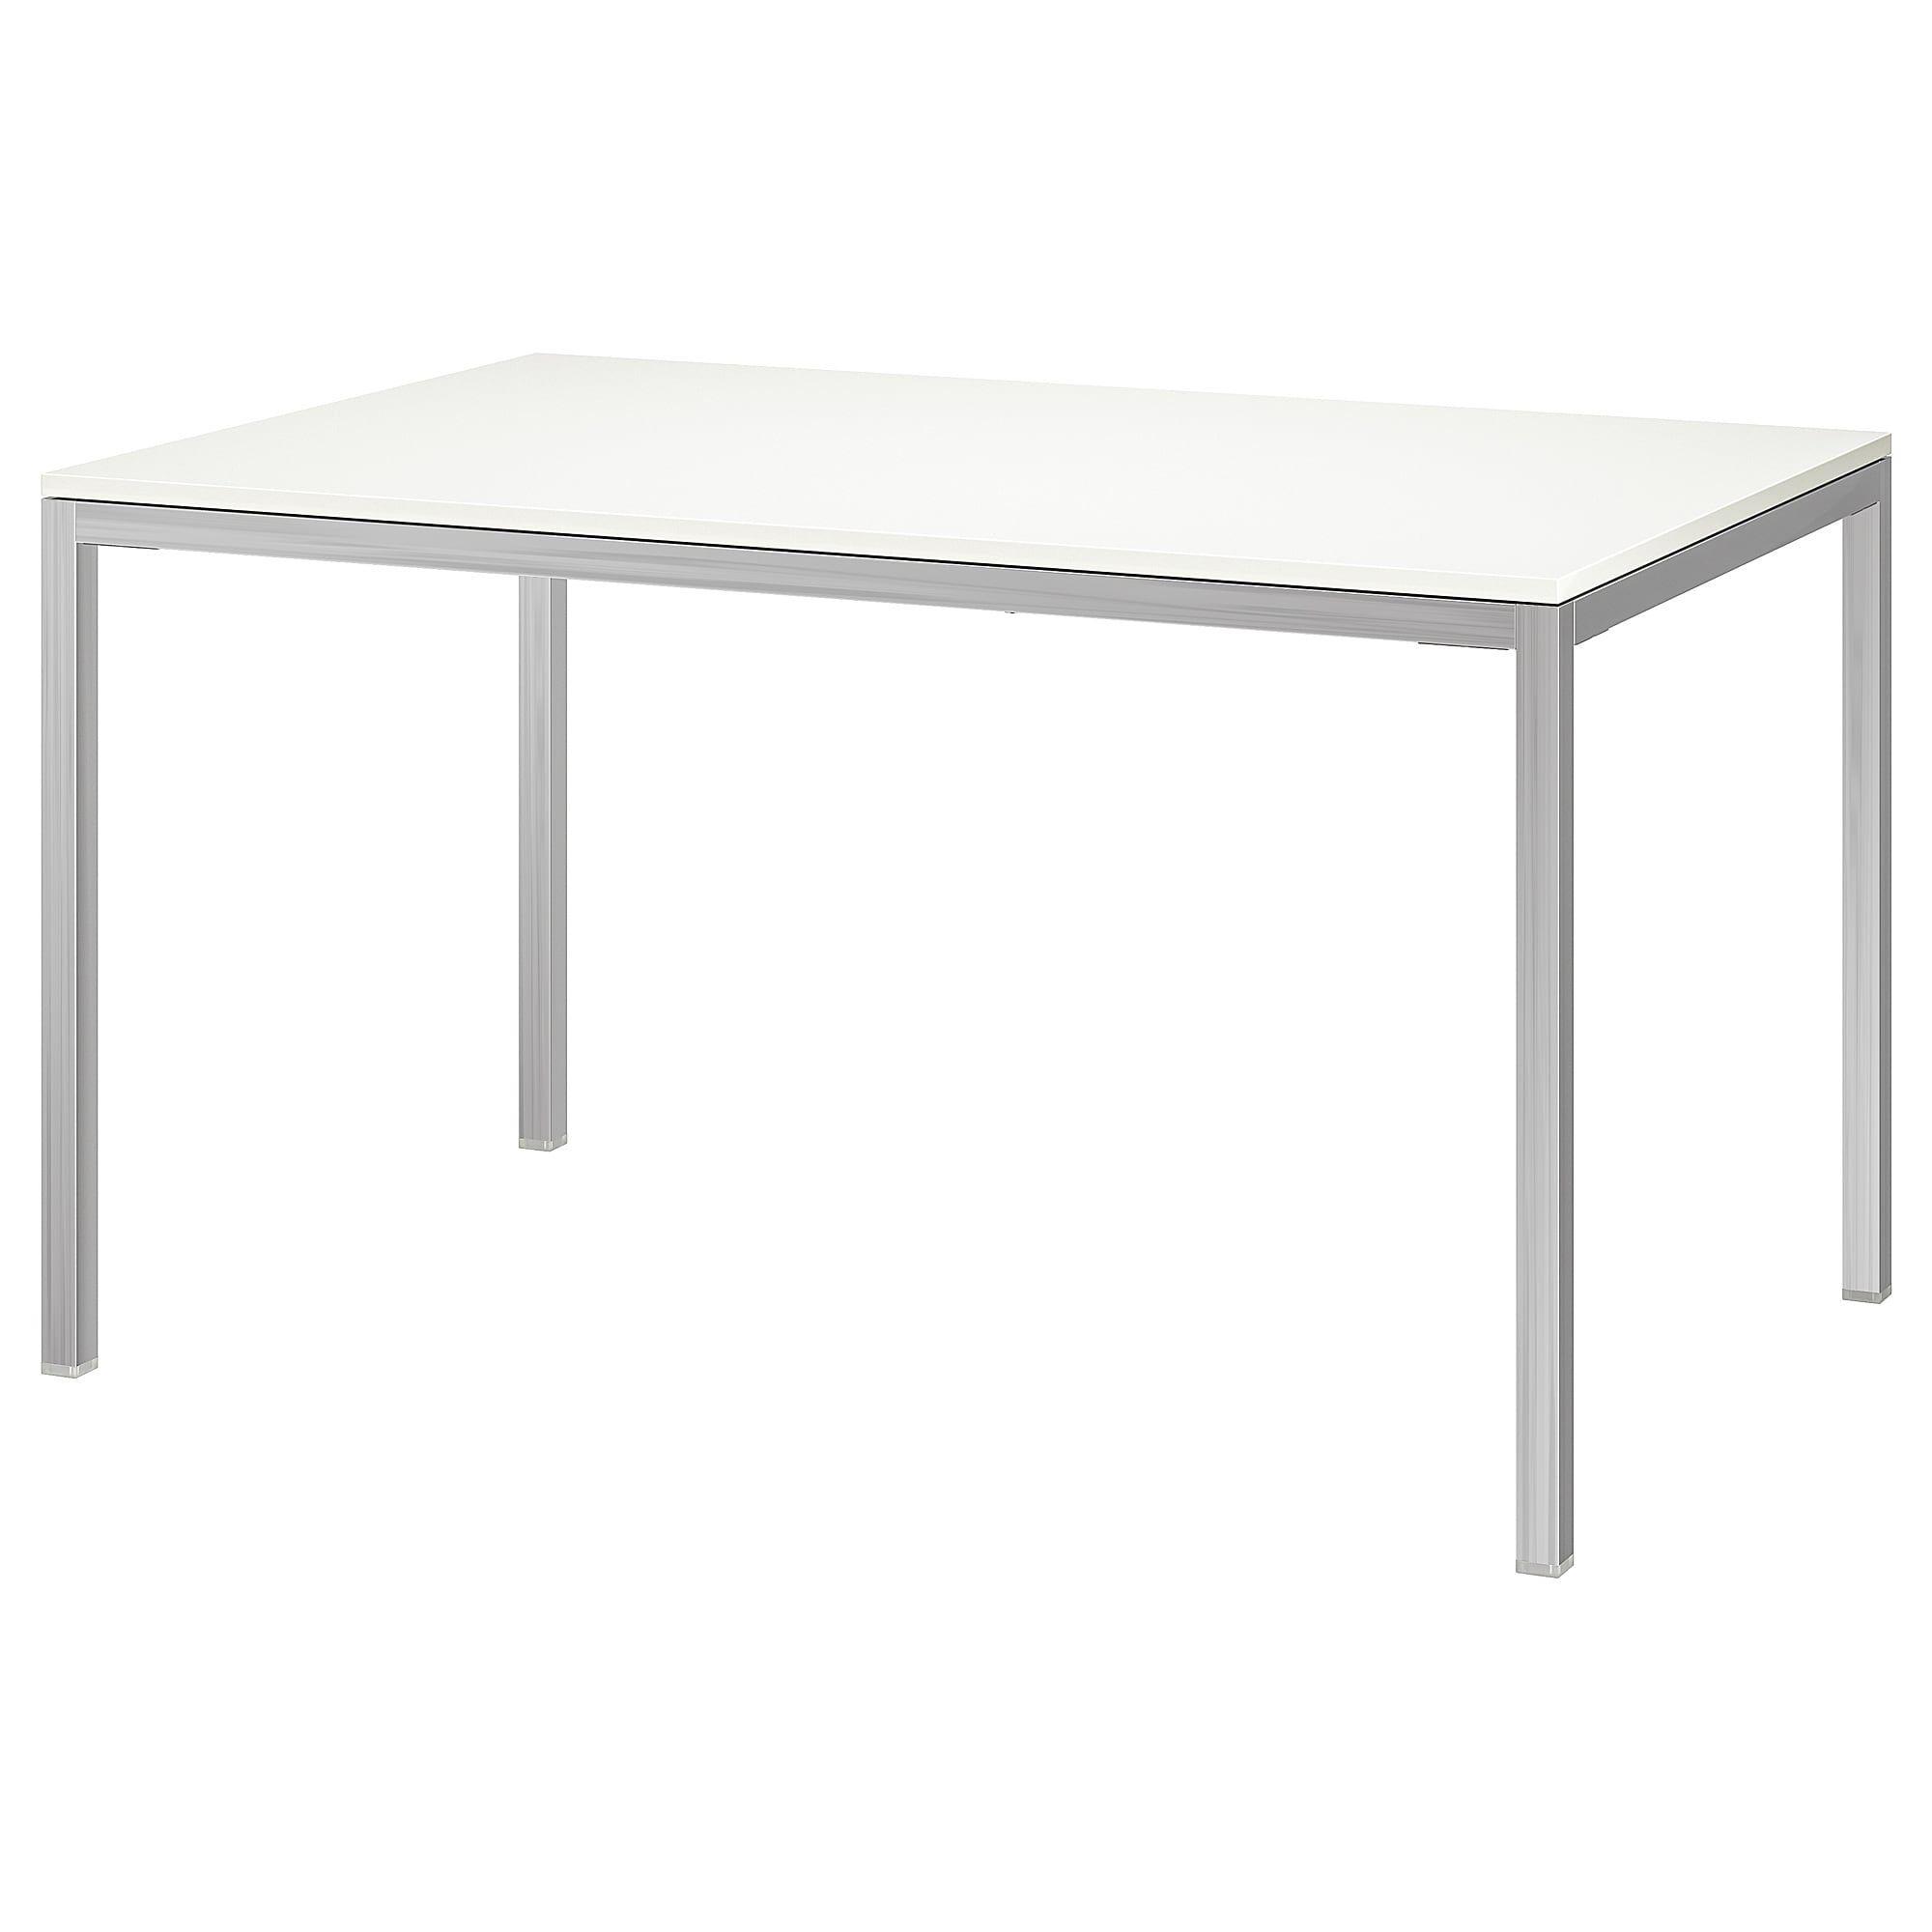 Torsby Table Chrome Plated High Gloss White 53 1 8x33 1 2 Ikea Glass Coffee Table Ikea Dining Table Ikea Table